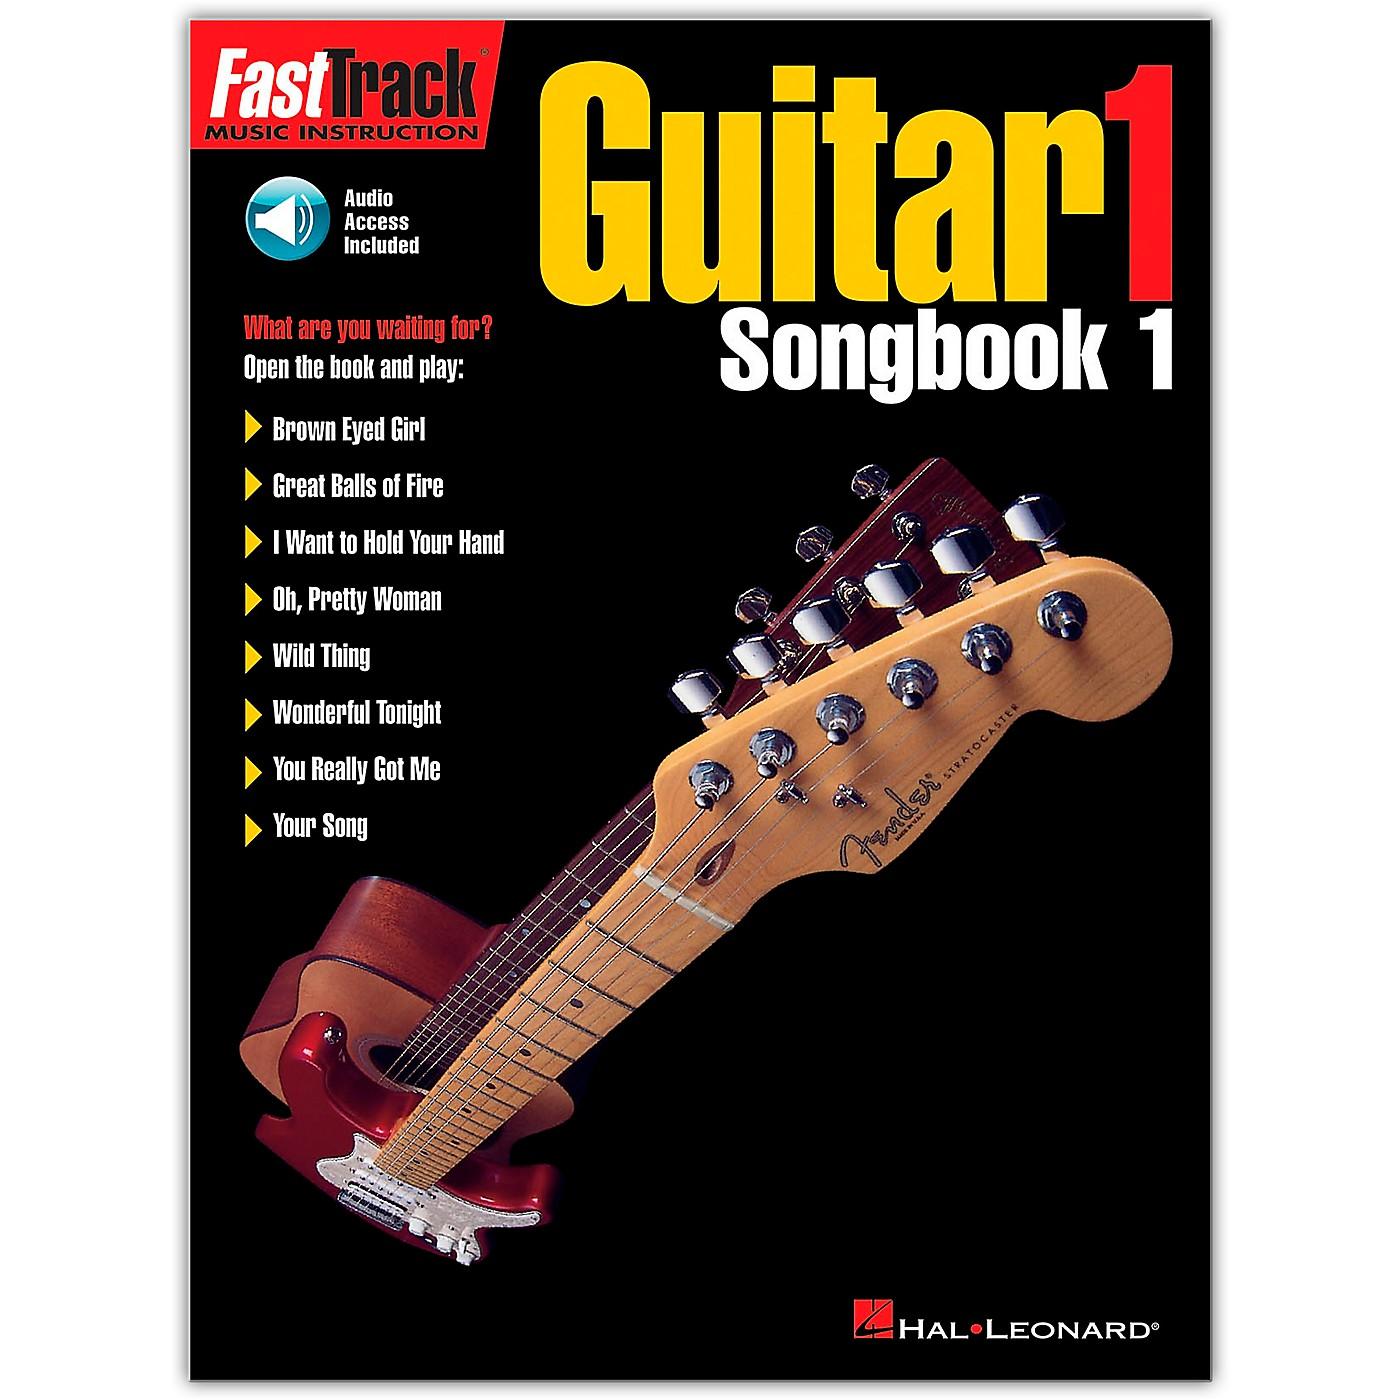 Hal Leonard FastTrack Guitar Songbook 1 Level 1 (Book/Online Audio) thumbnail